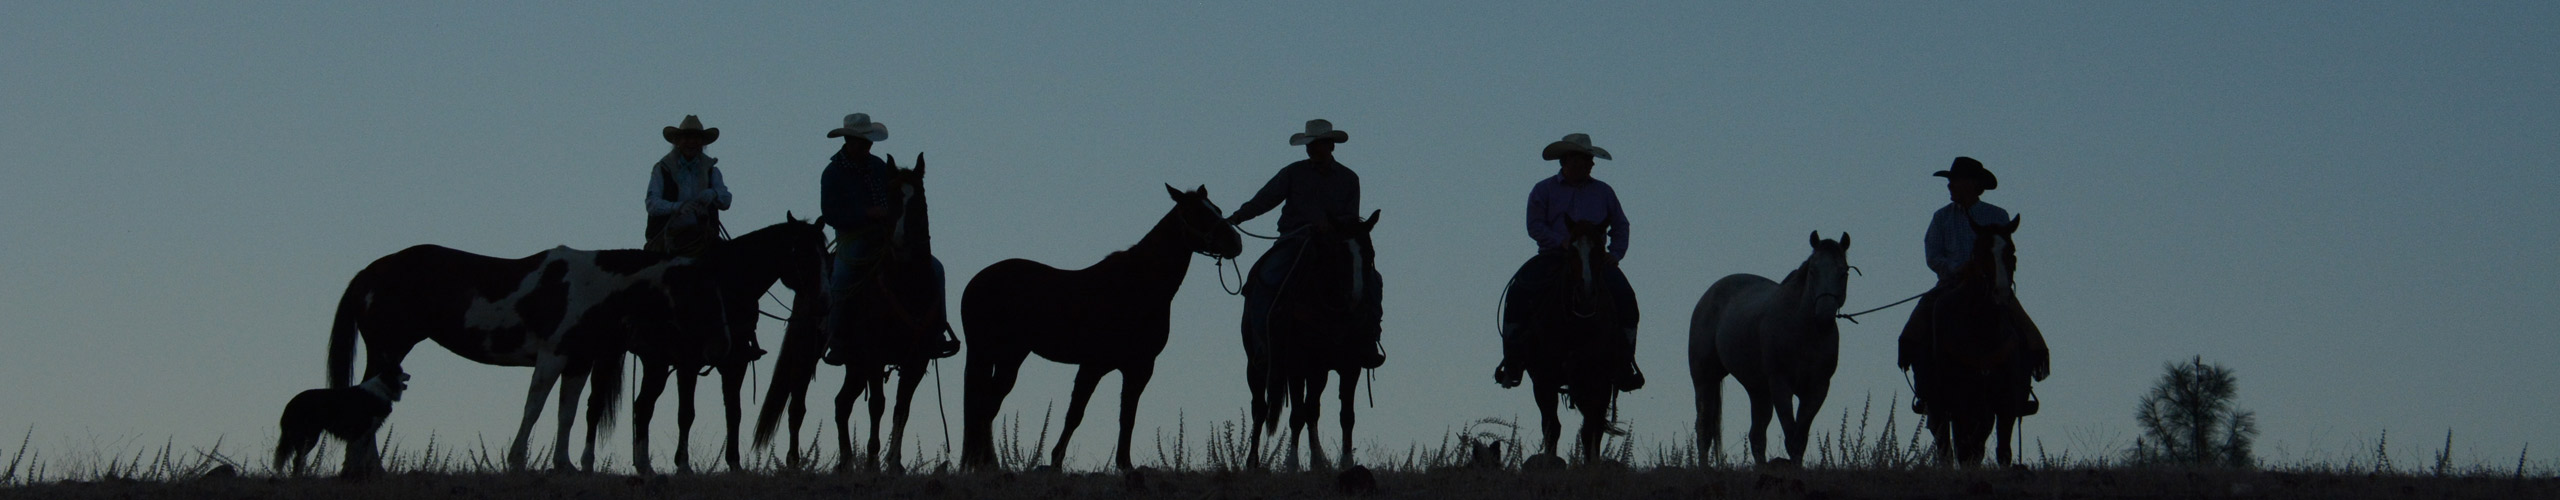 V6_Ranch_Silhouette